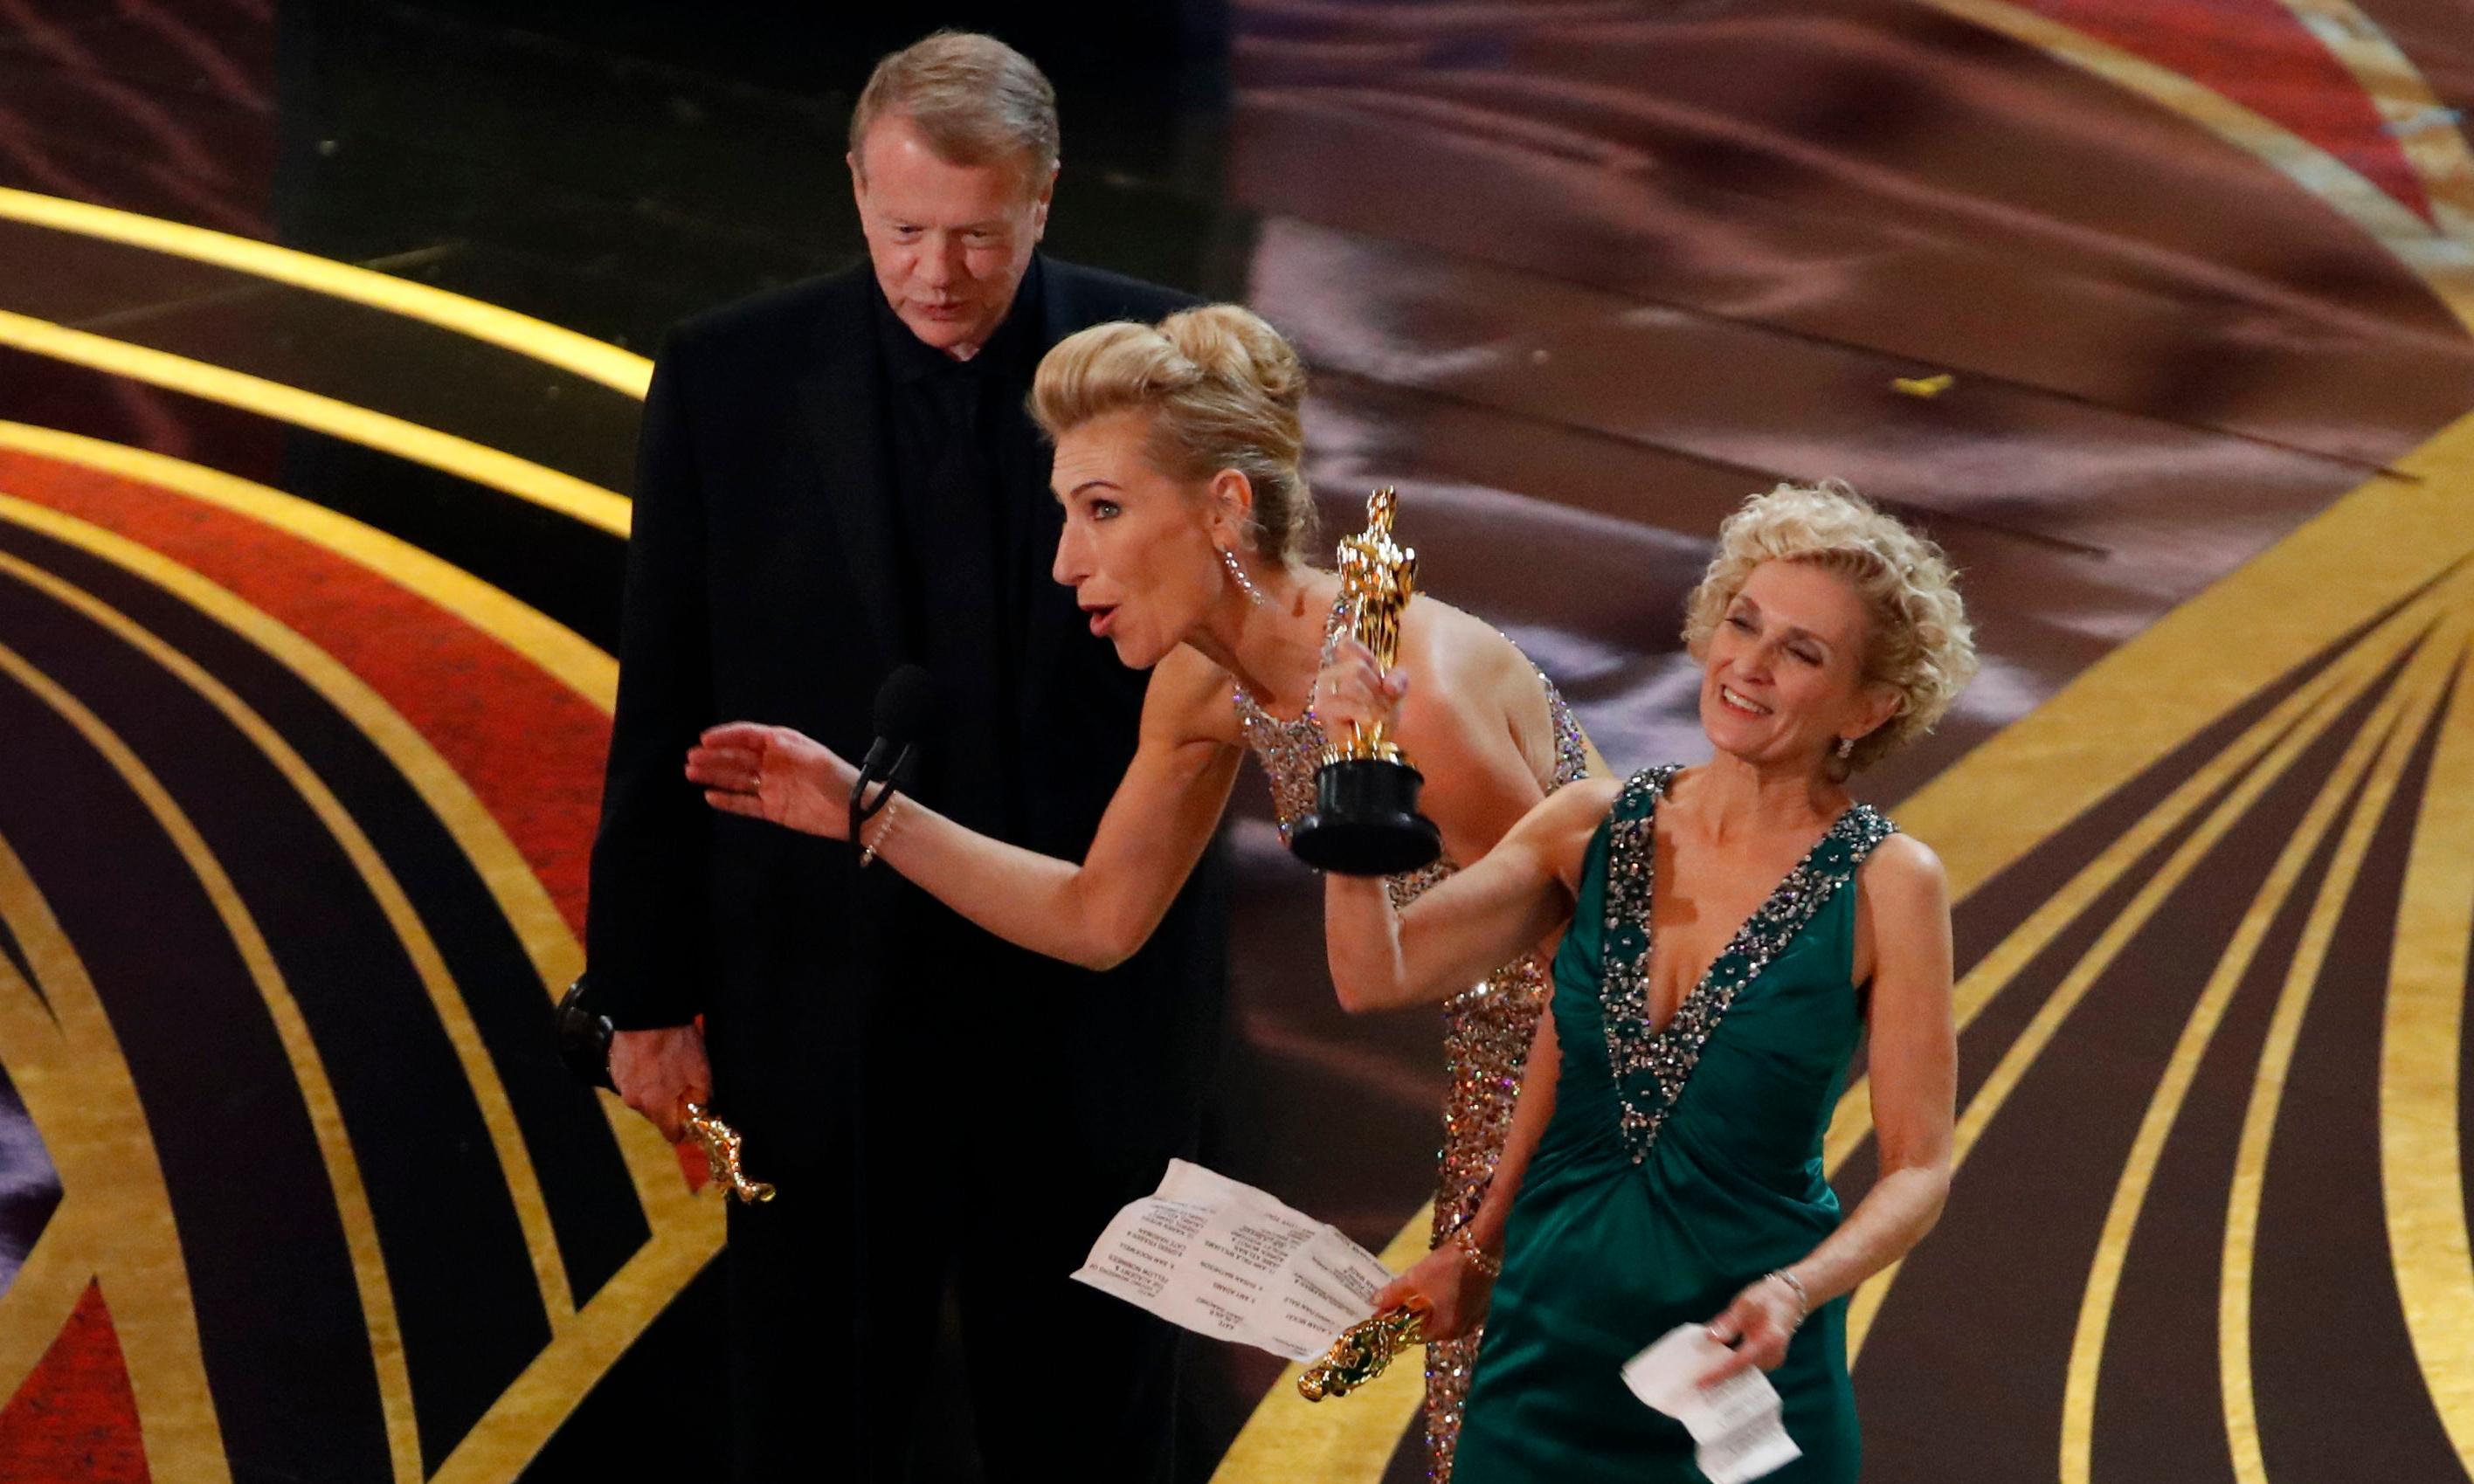 How the Vice make-up team won the Oscar for world's worst speech